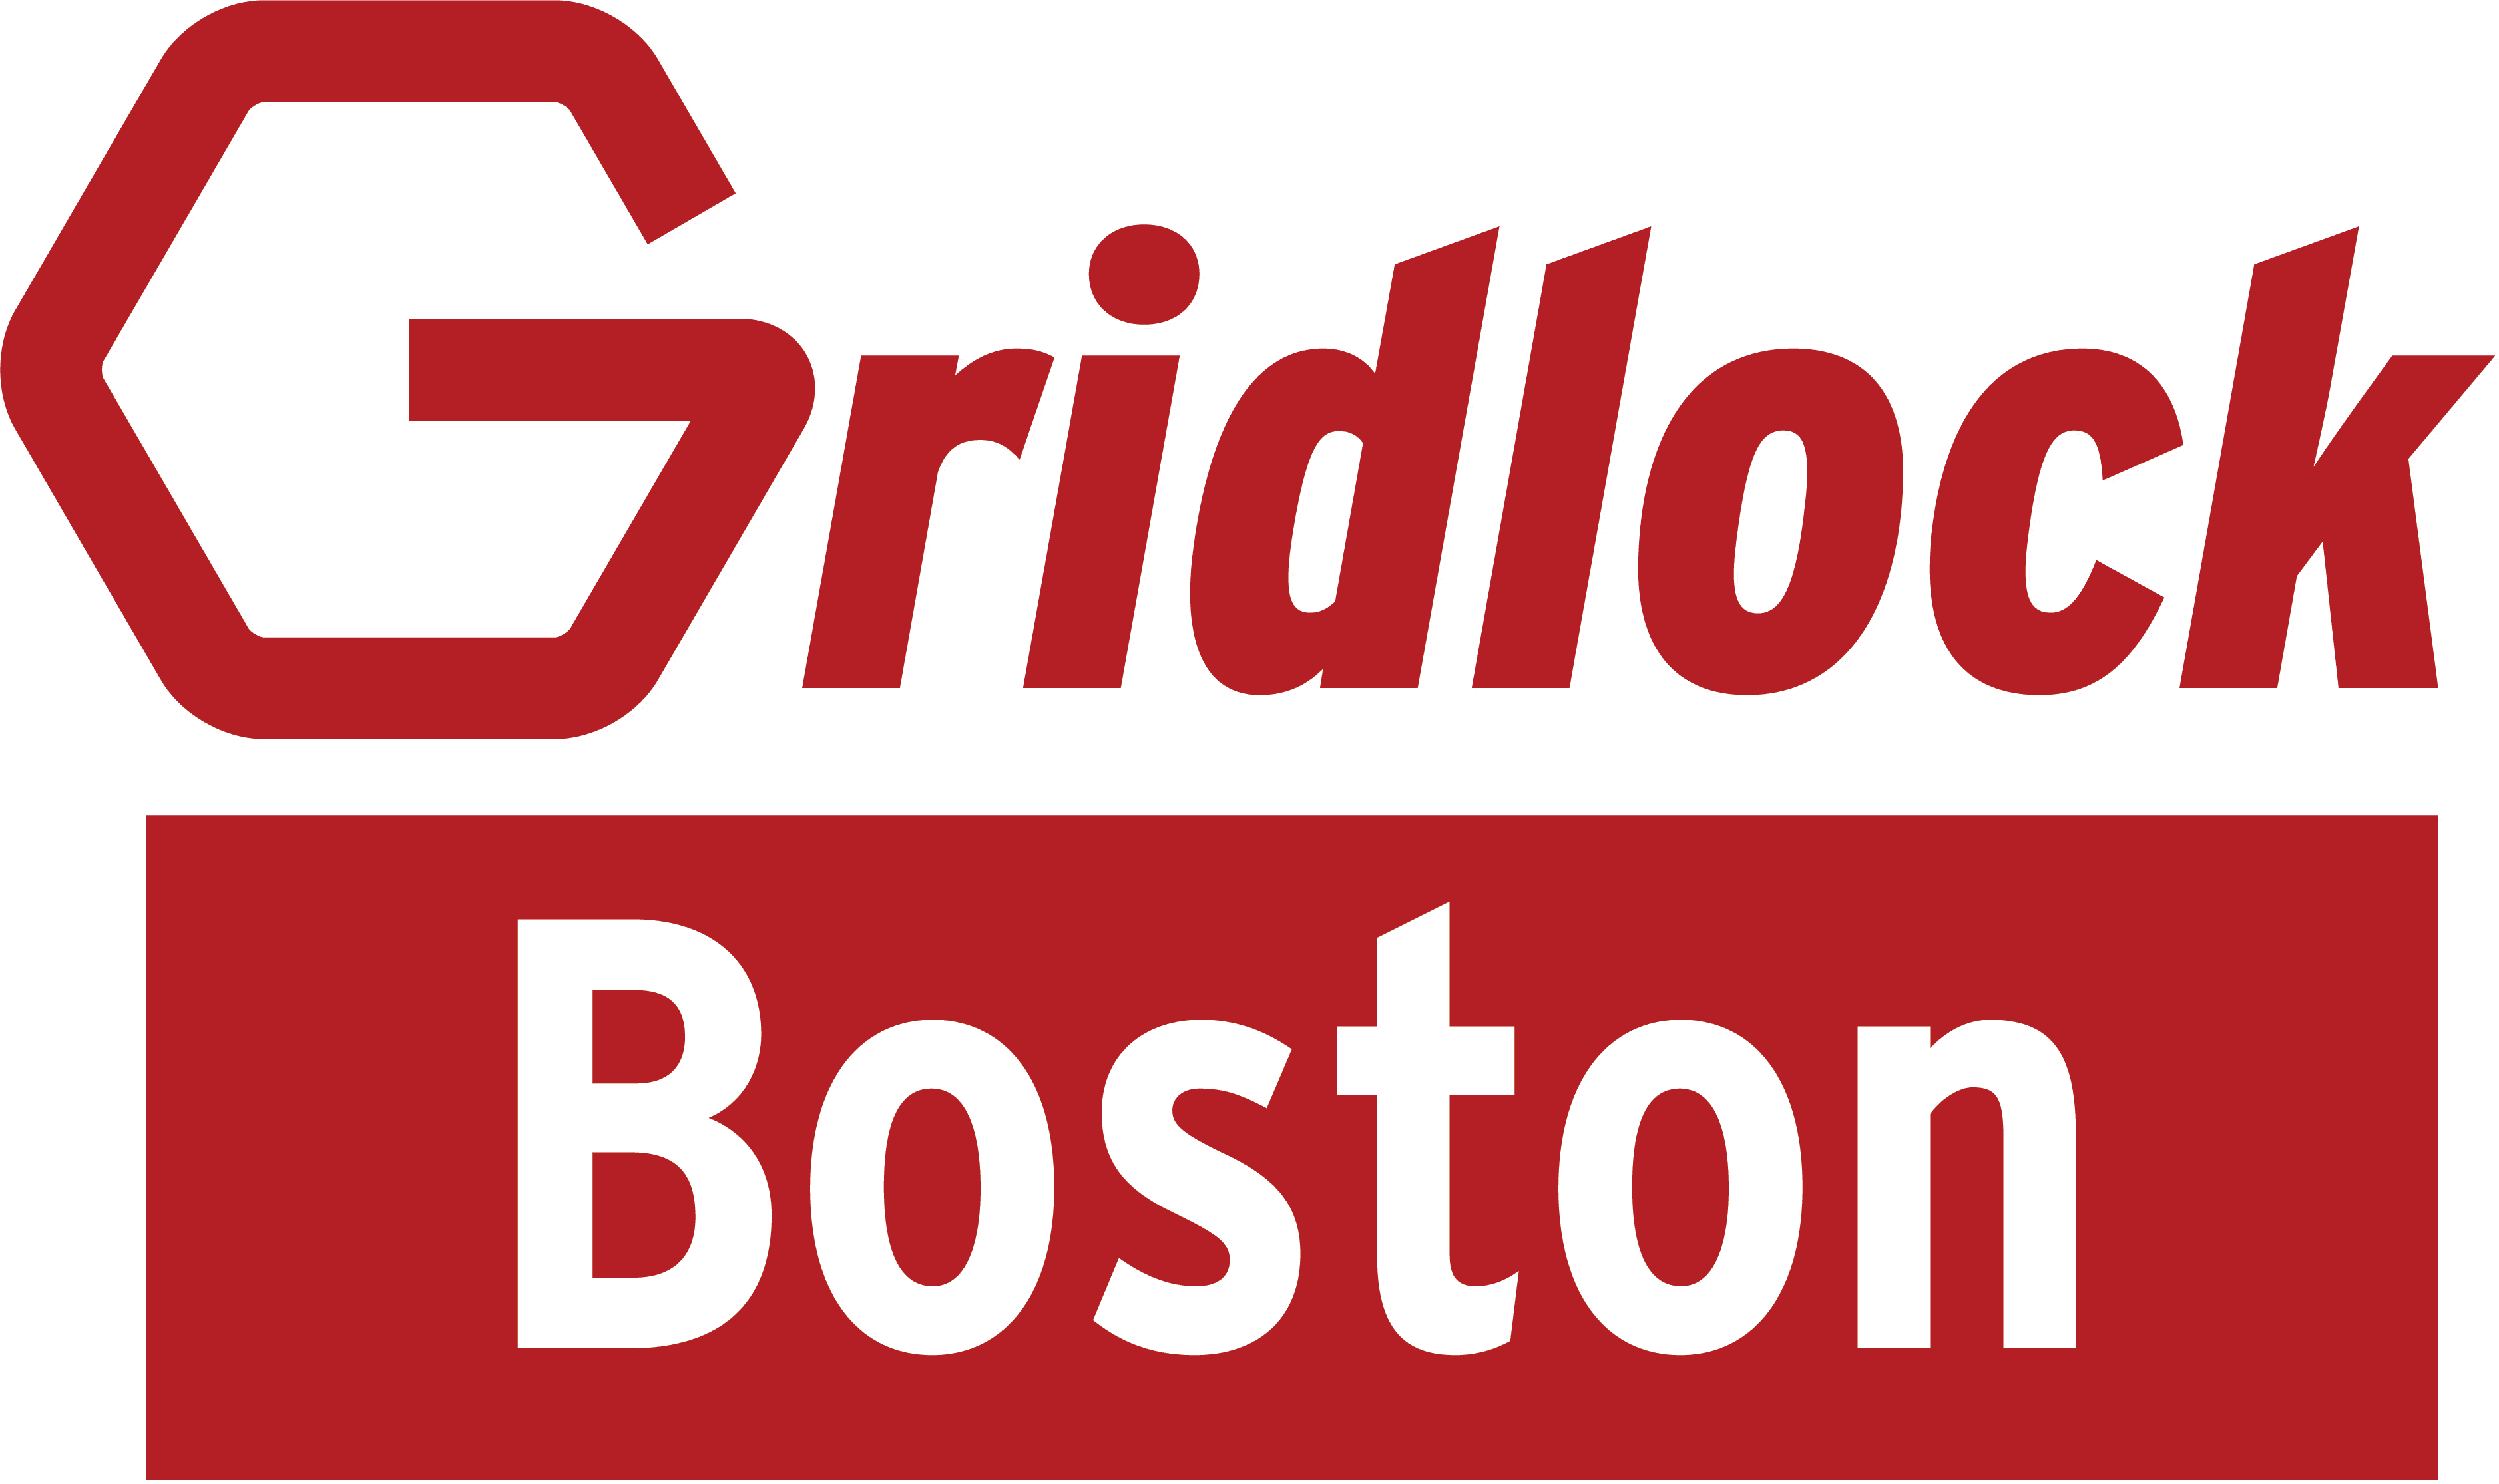 Gridlock: Boston